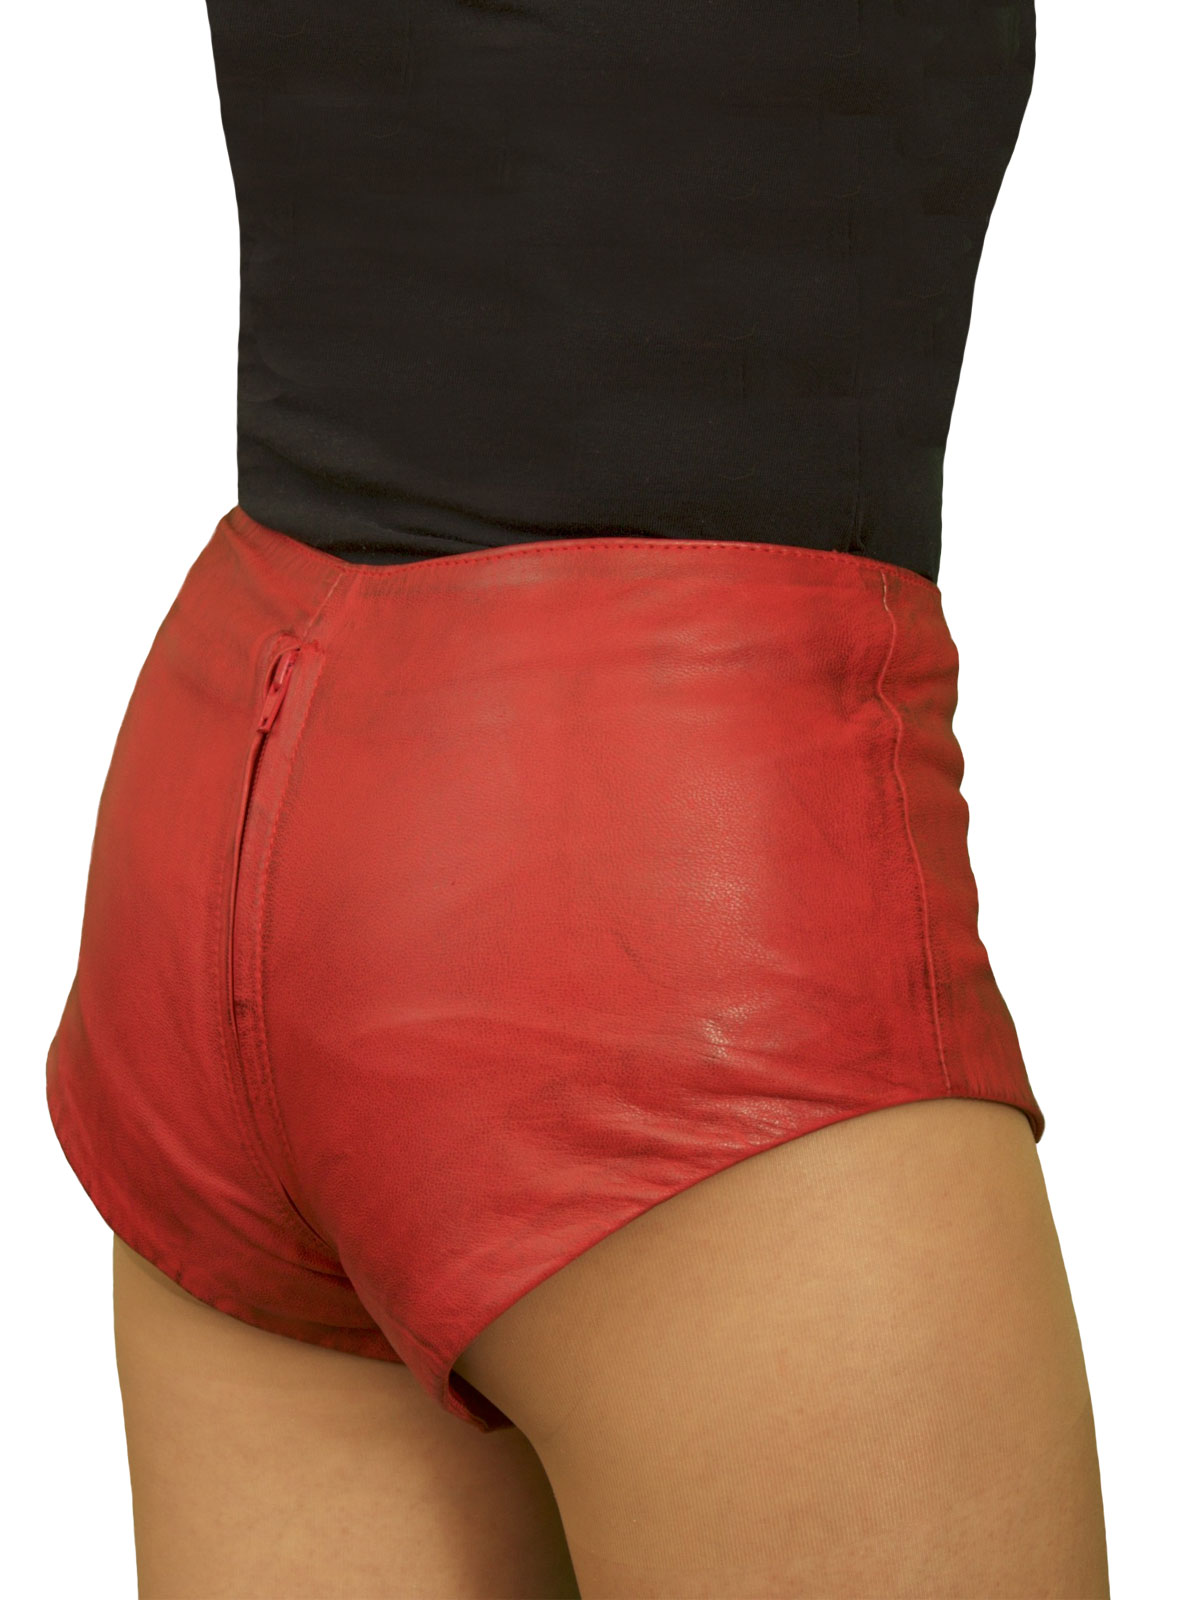 Leather Hot Pants, two-way crotch zip, mid-rise - Tout Ensemble